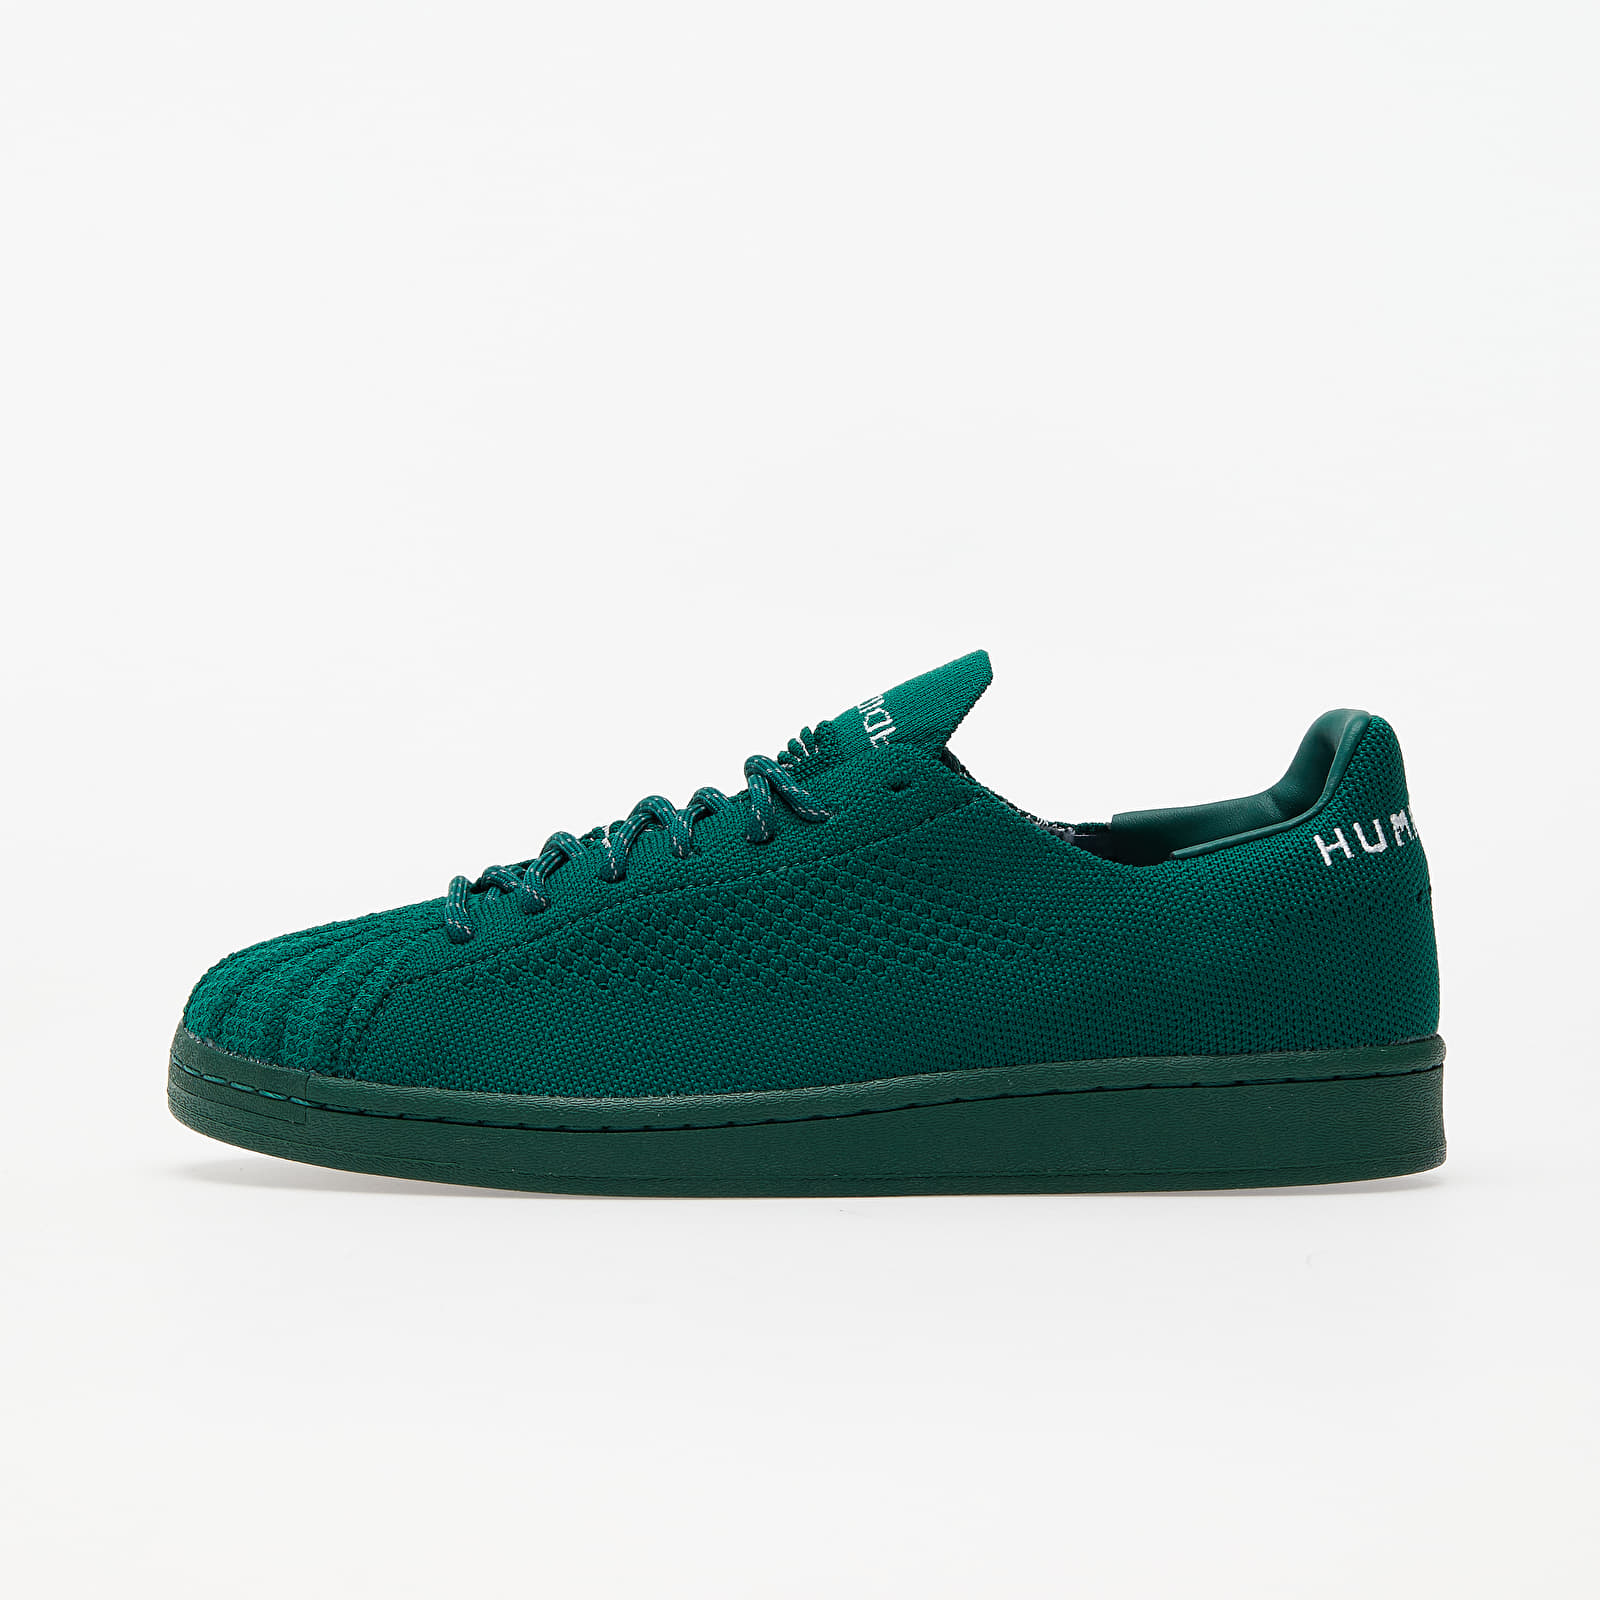 adidas x Pharrell Williams Superstar Pk Dark Green/ Dark Green/ Sky Tint S42928